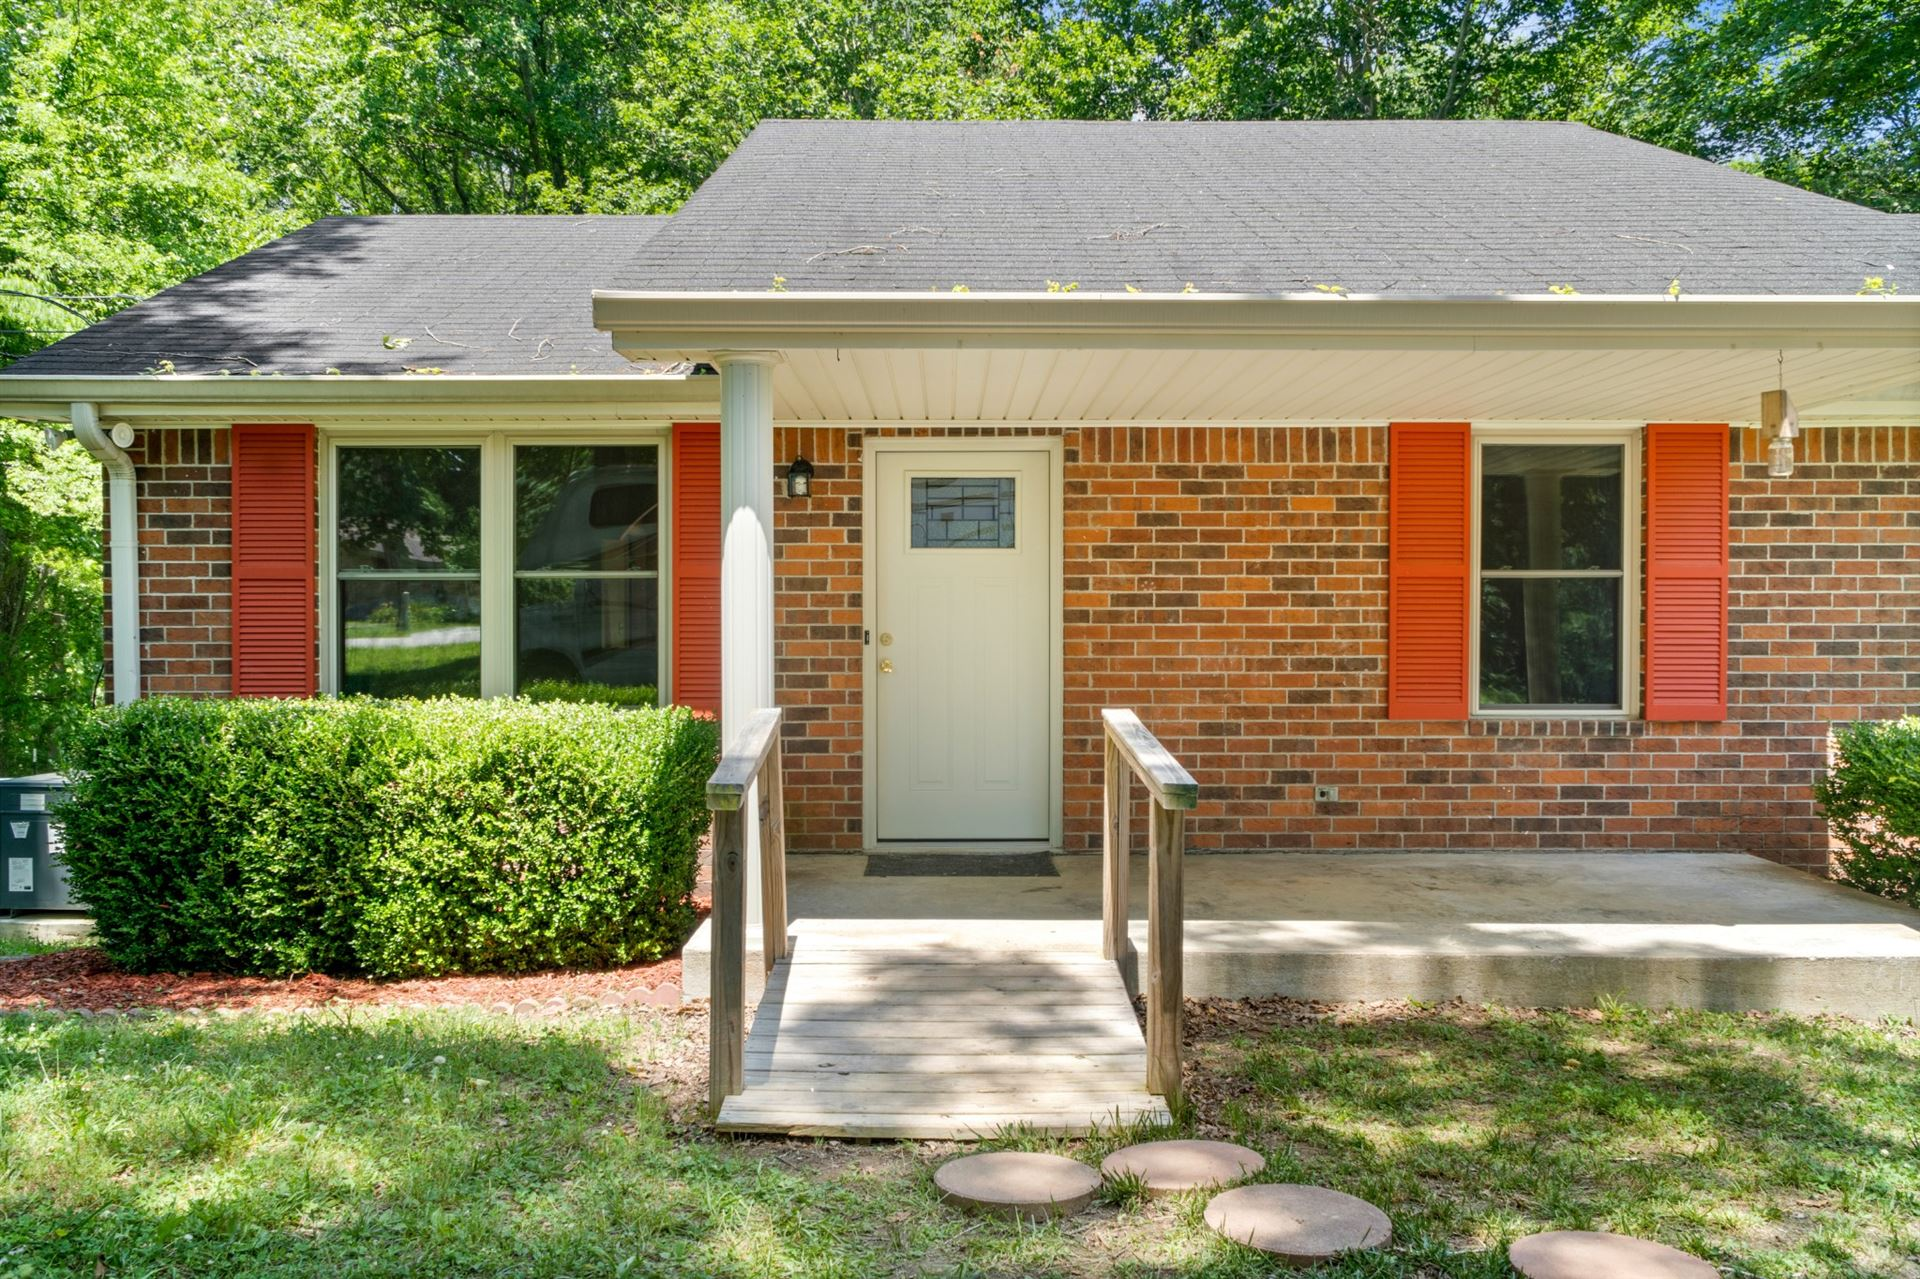 1088 Murff Acres Rd, Ashland City, TN 37015 - MLS#: 2153994